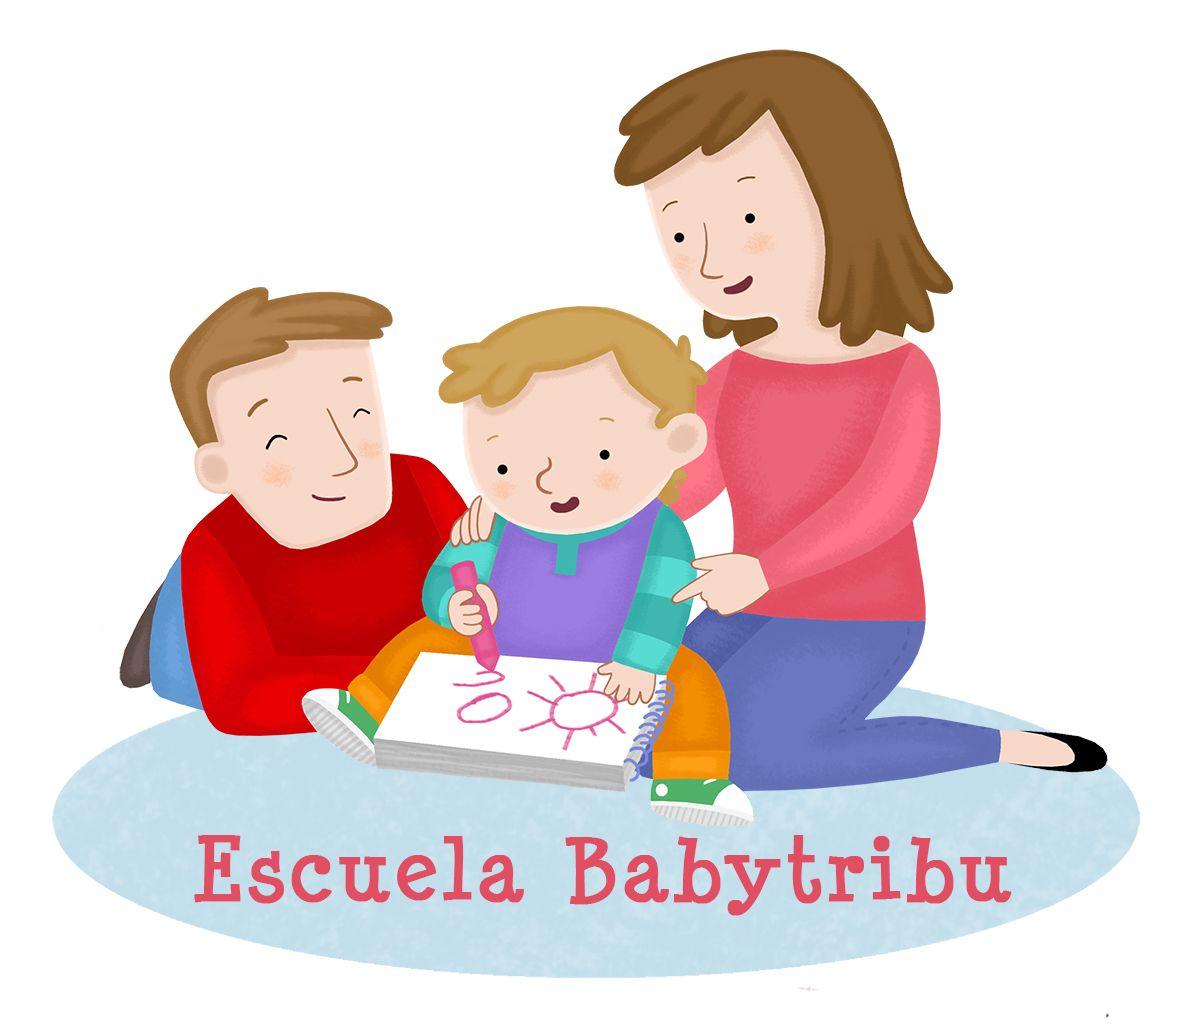 Escuela babytribu_1200x1030